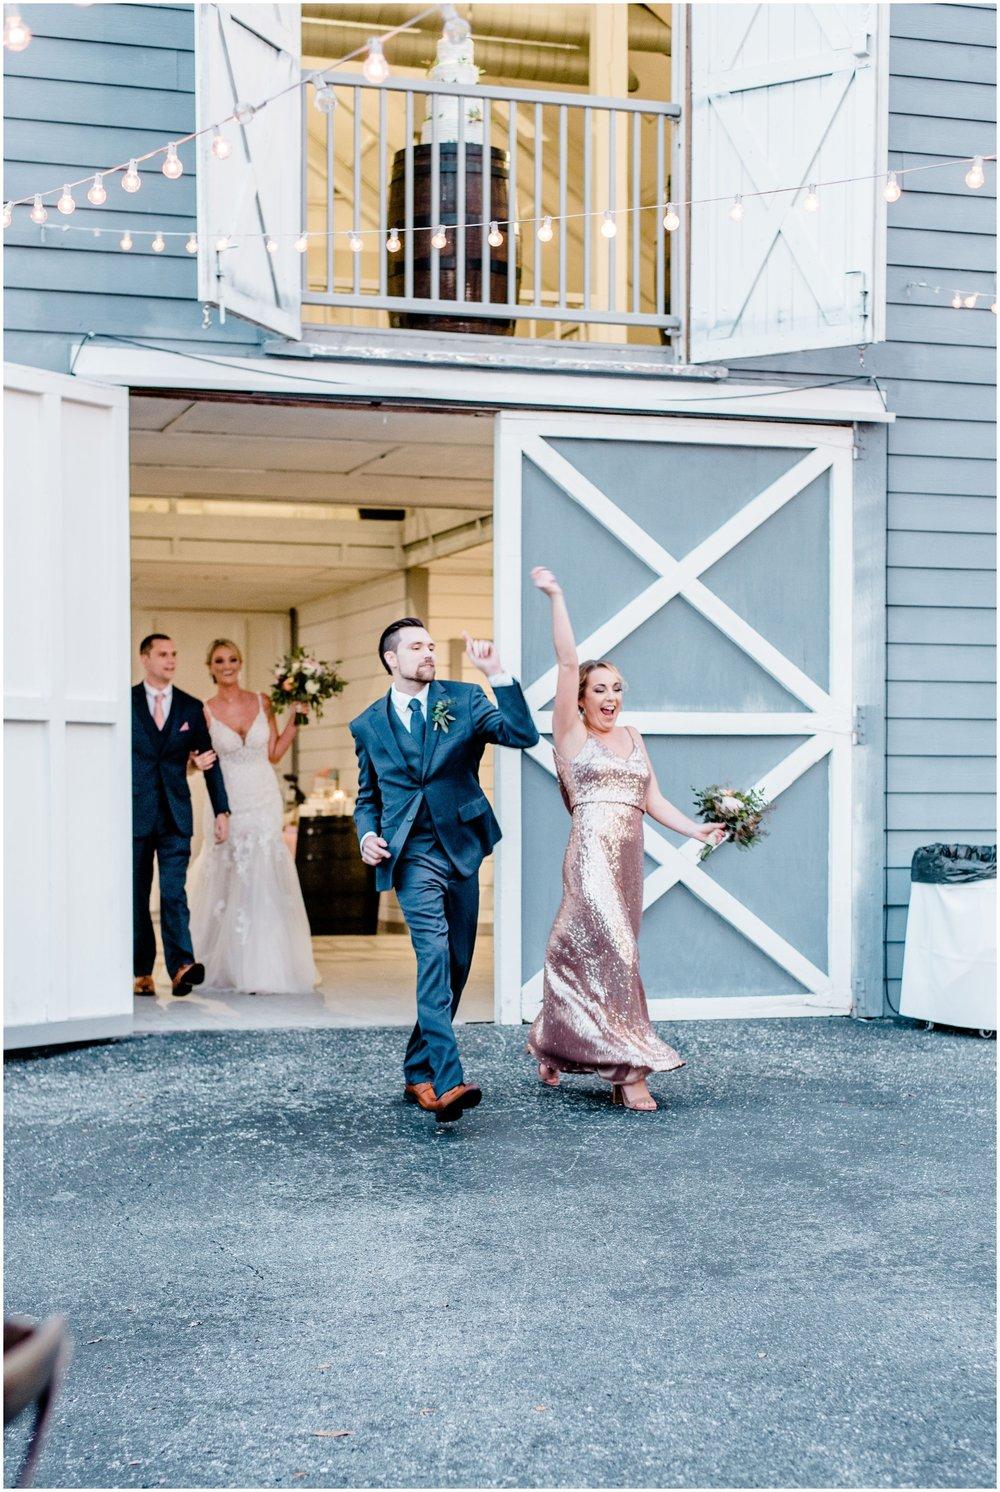 Bridesmaid and groom